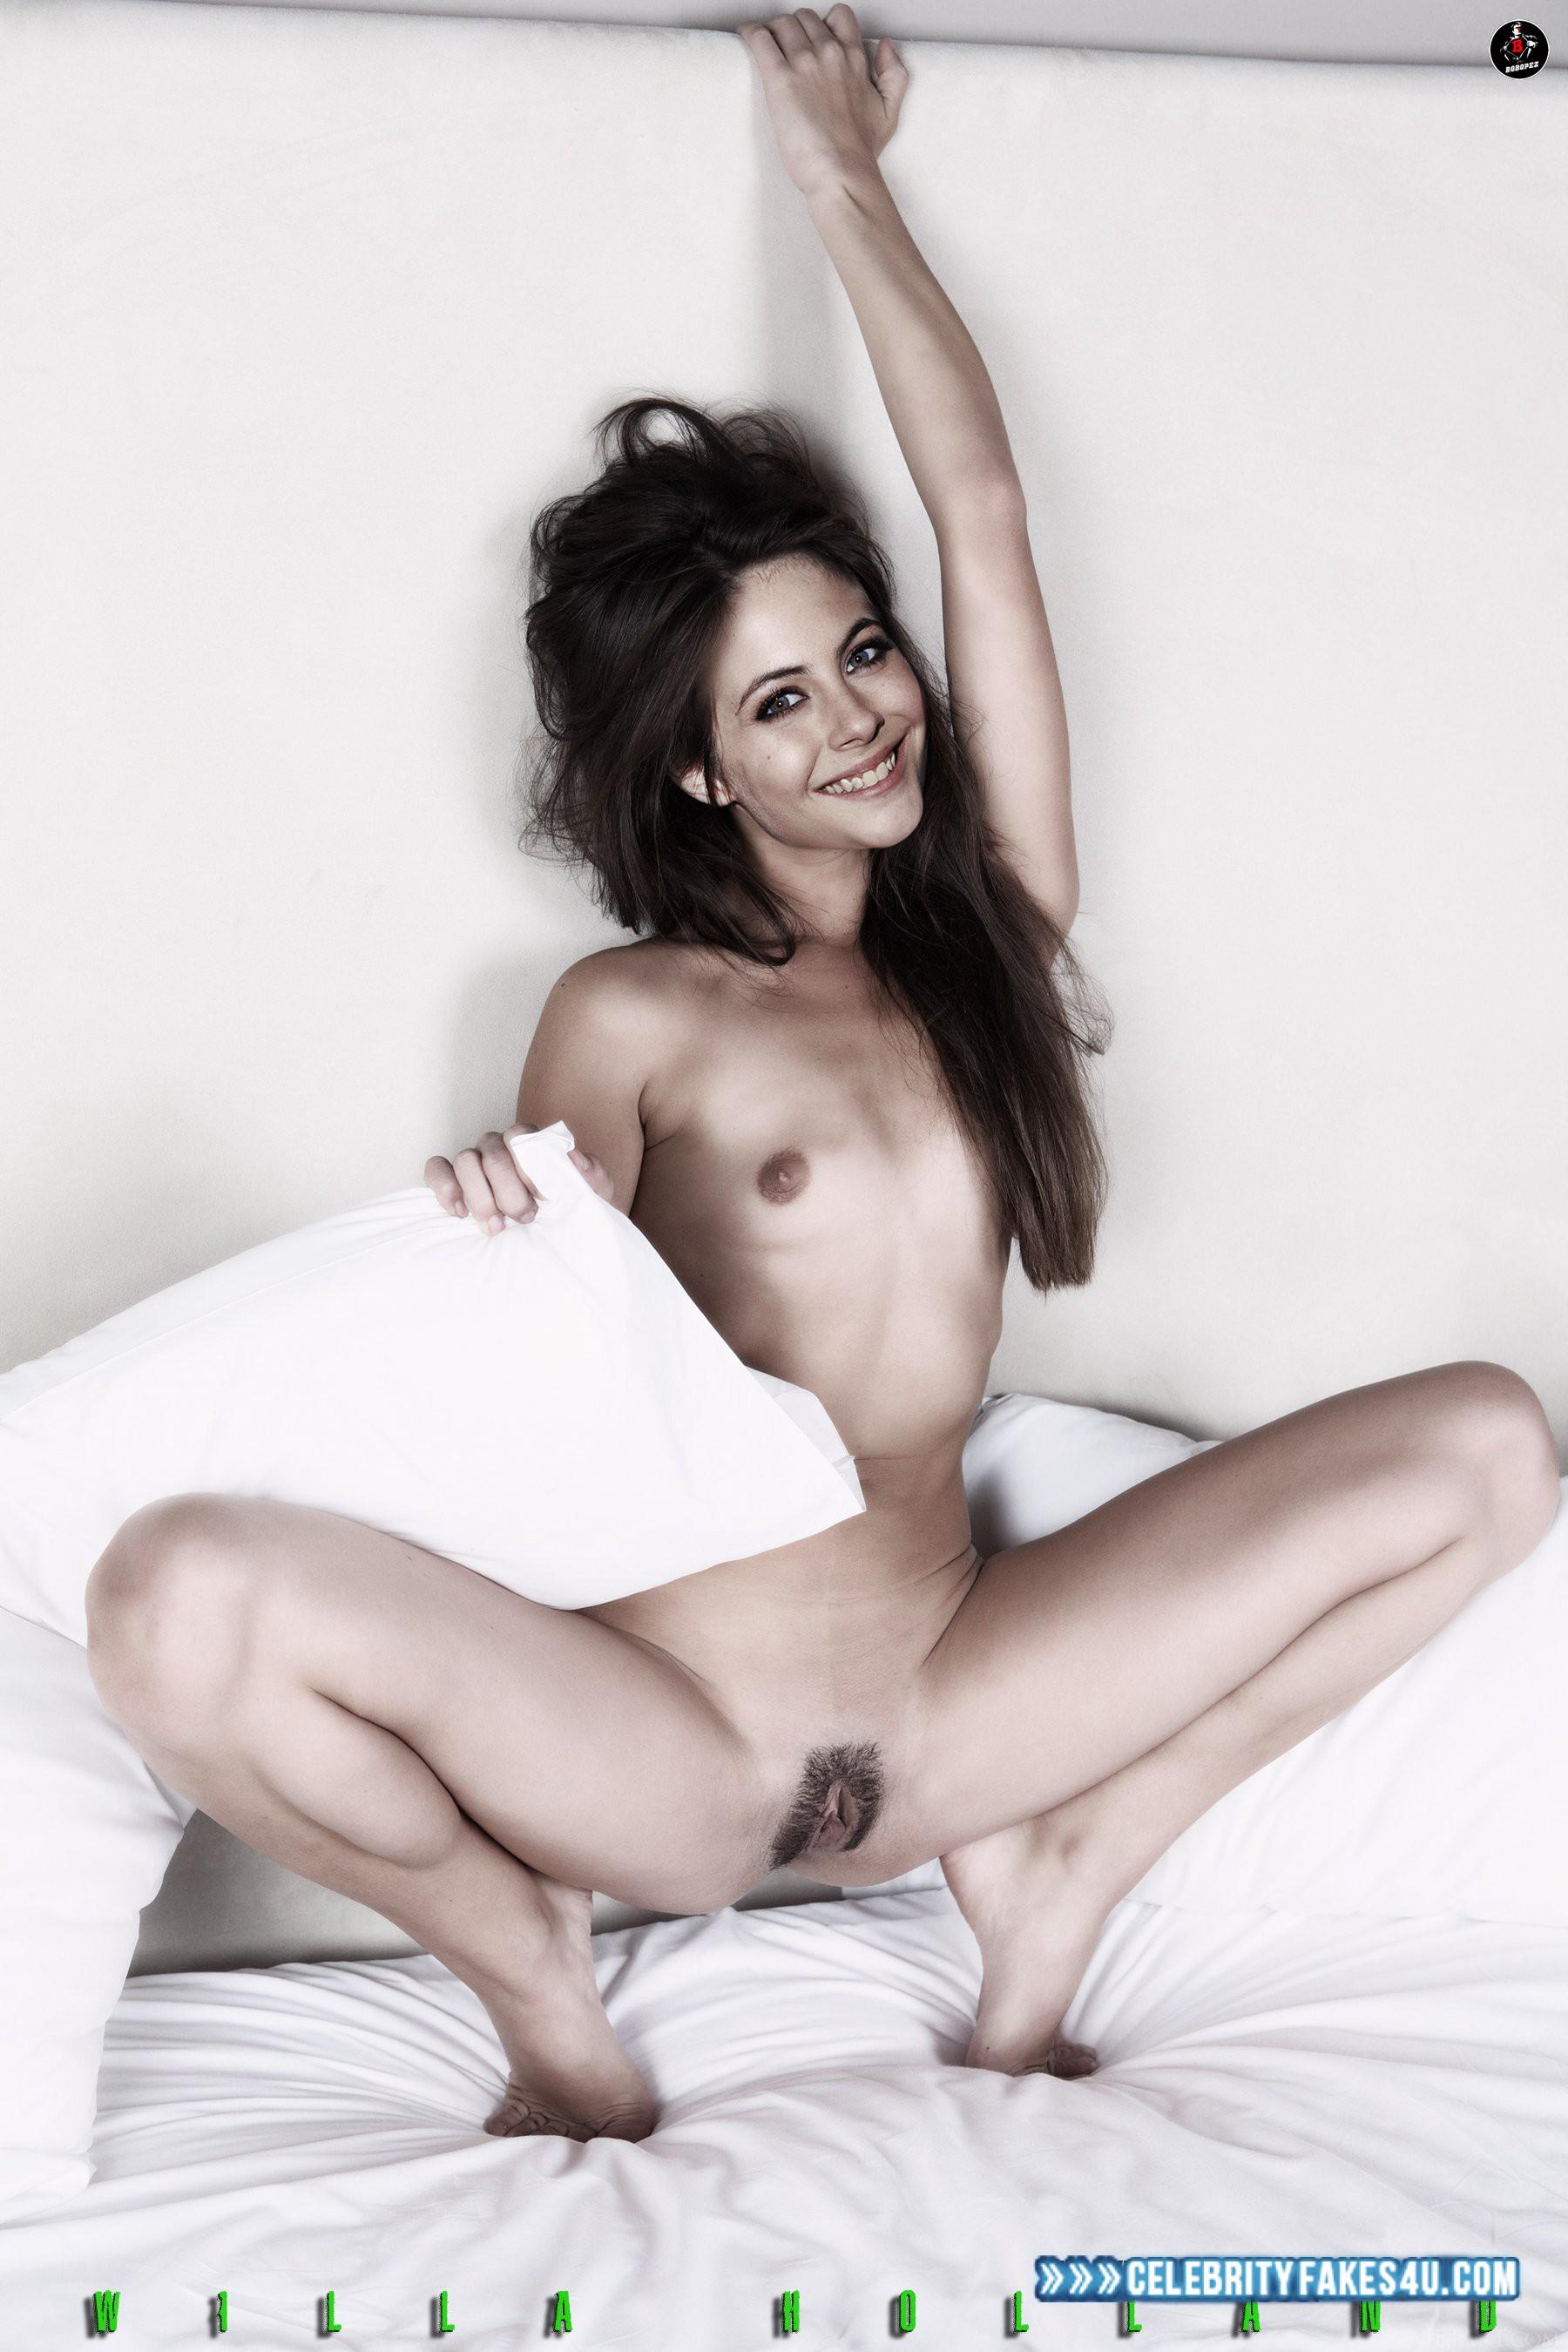 Willa holland porn fakes photo 981